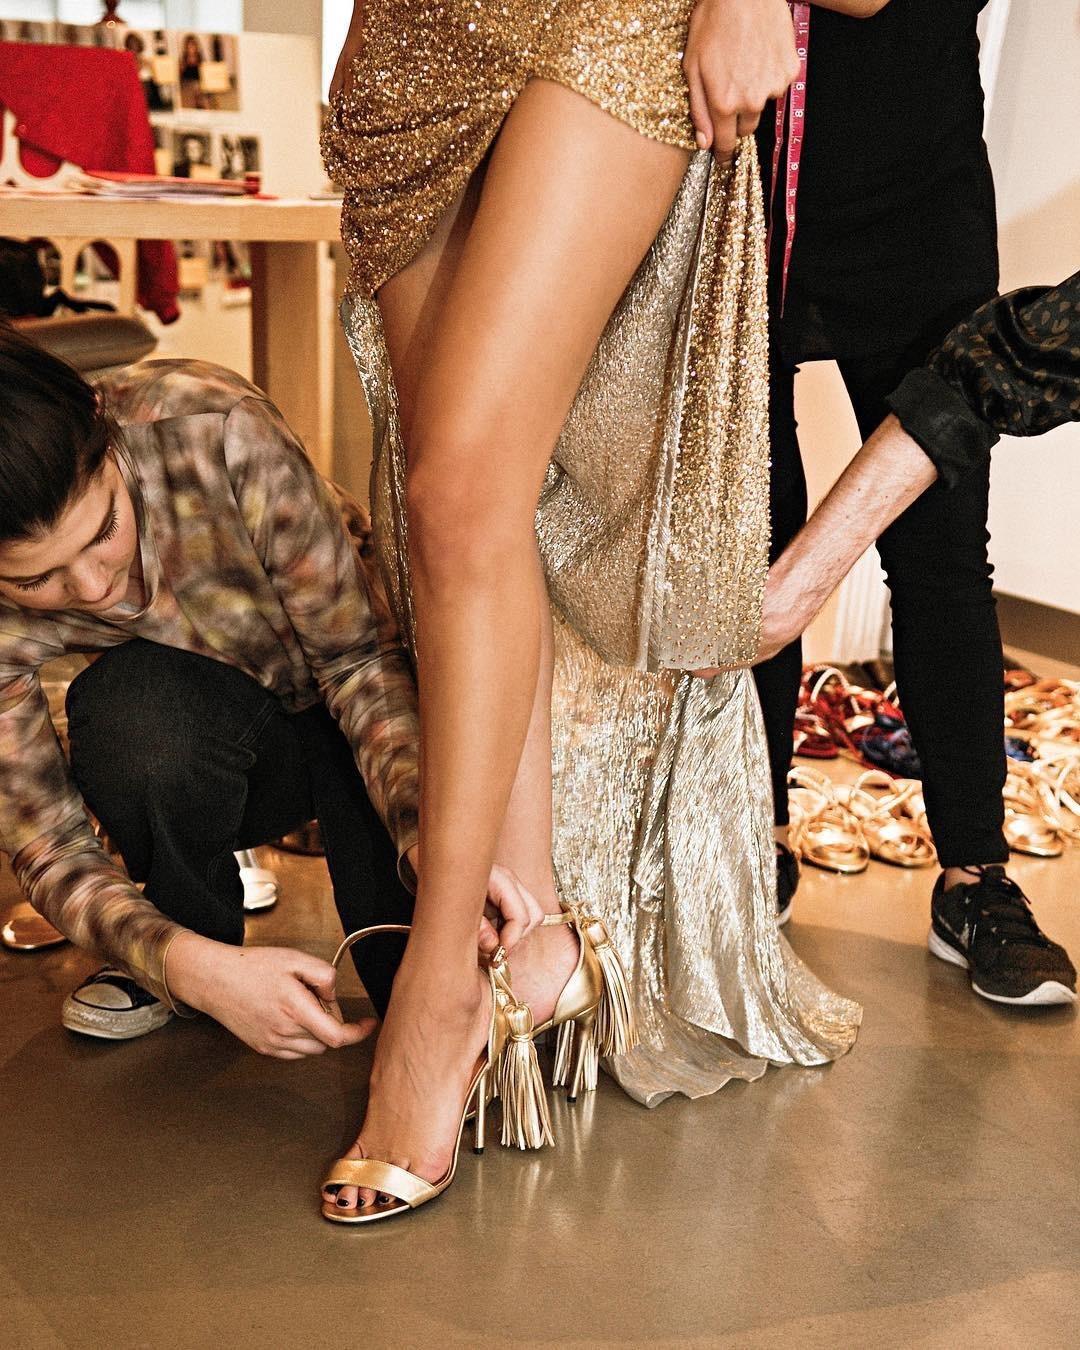 Feet Feet Marielle Hadid naked photo 2017